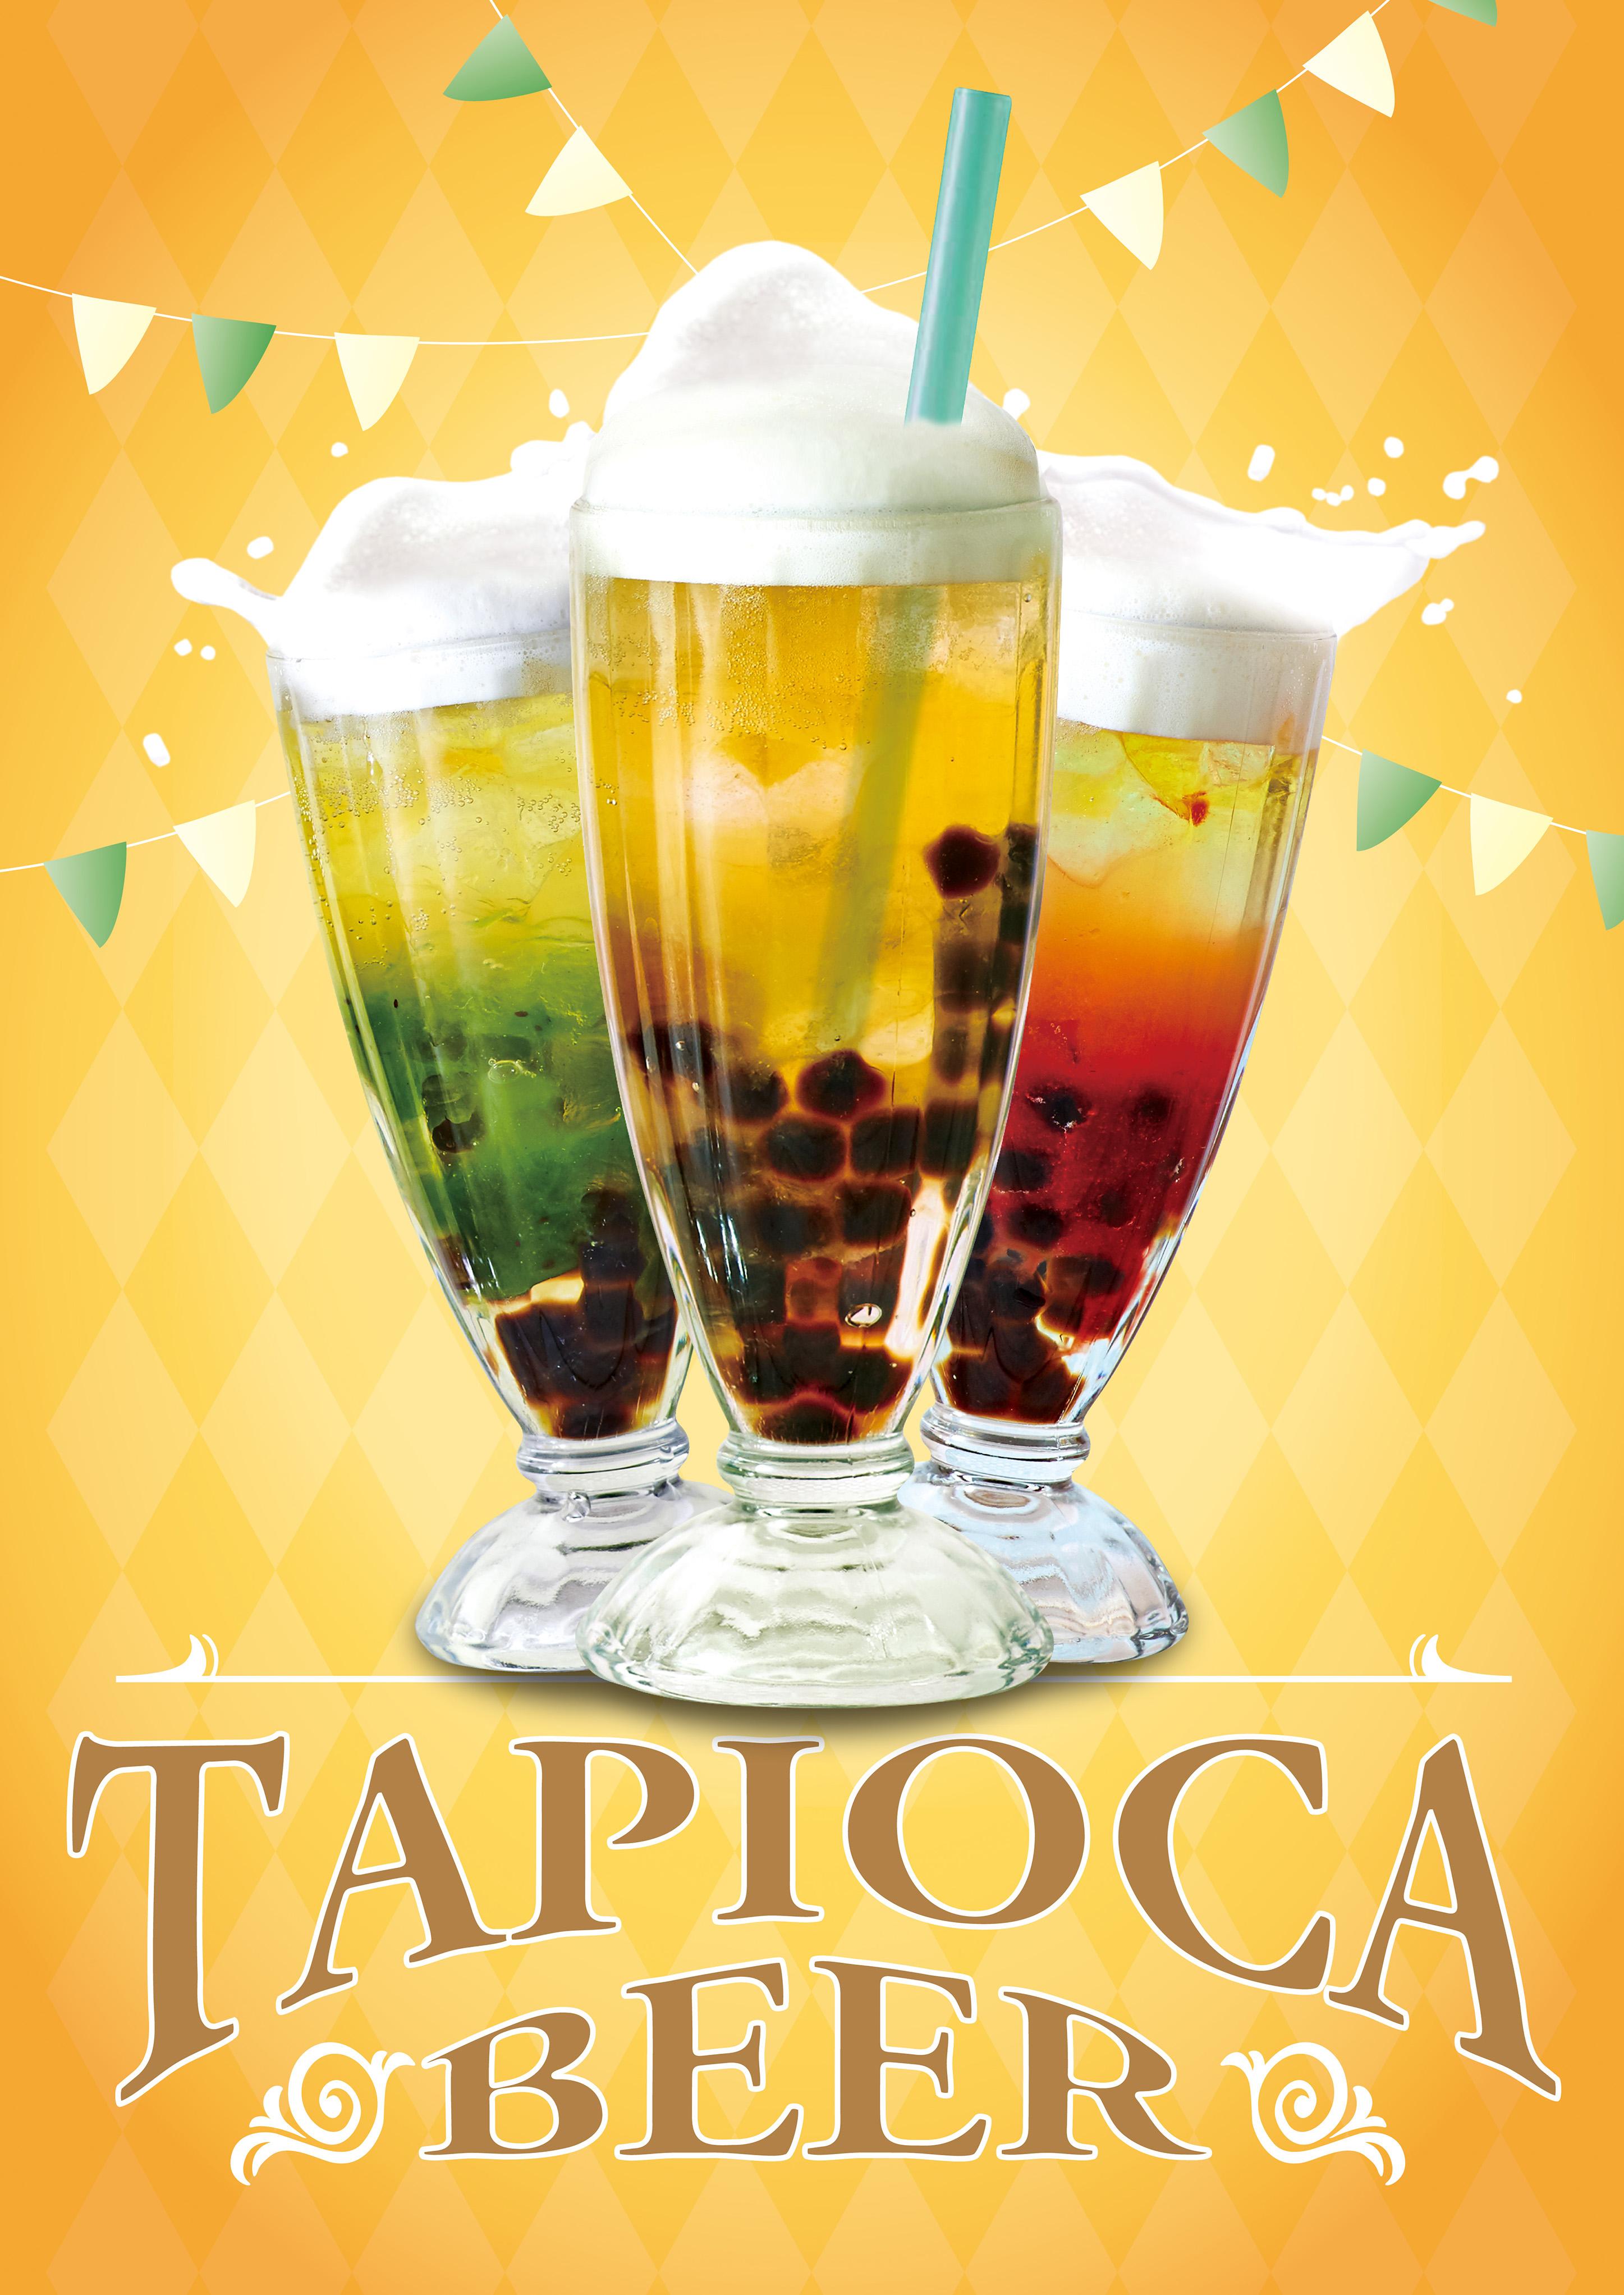 【iBEER LE SUN PALM】ビールとタピオカをあわせたネクストドリンク!「タピオカ・ザ・ネクスト タピオカビール」